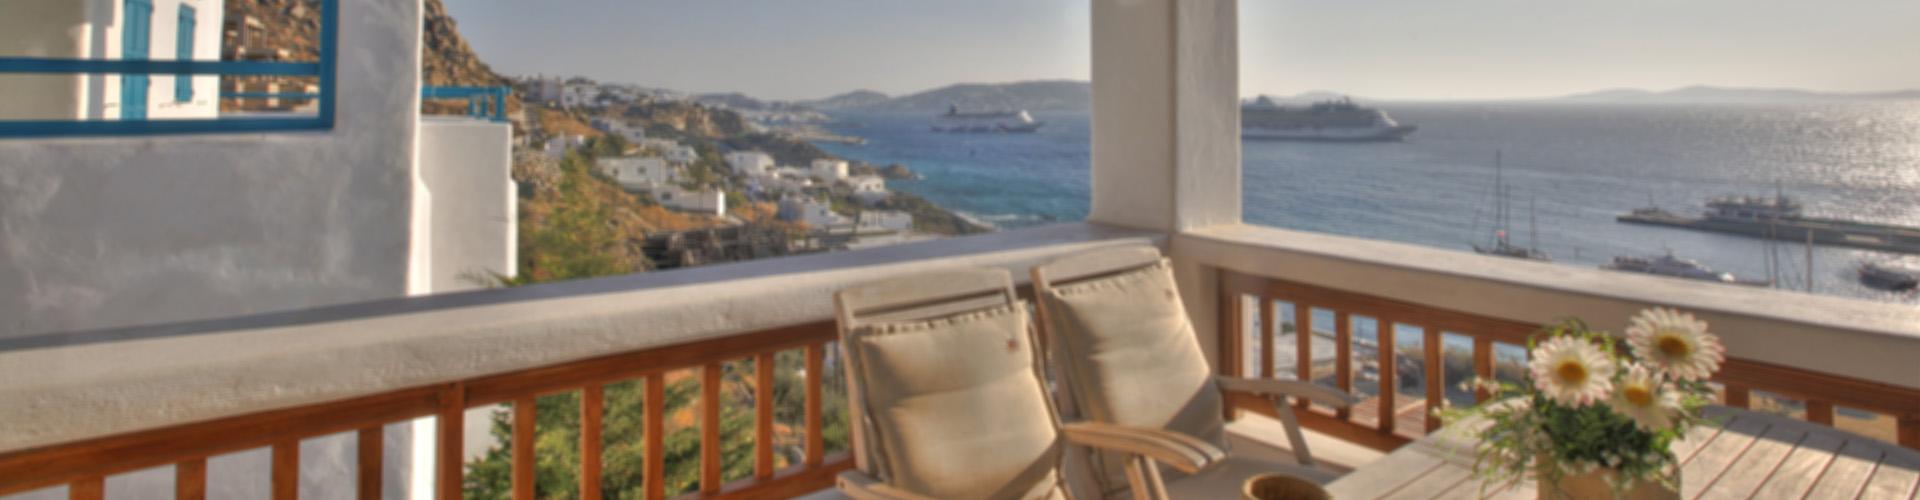 Apartment balcony seaview tourlos, Mykonos